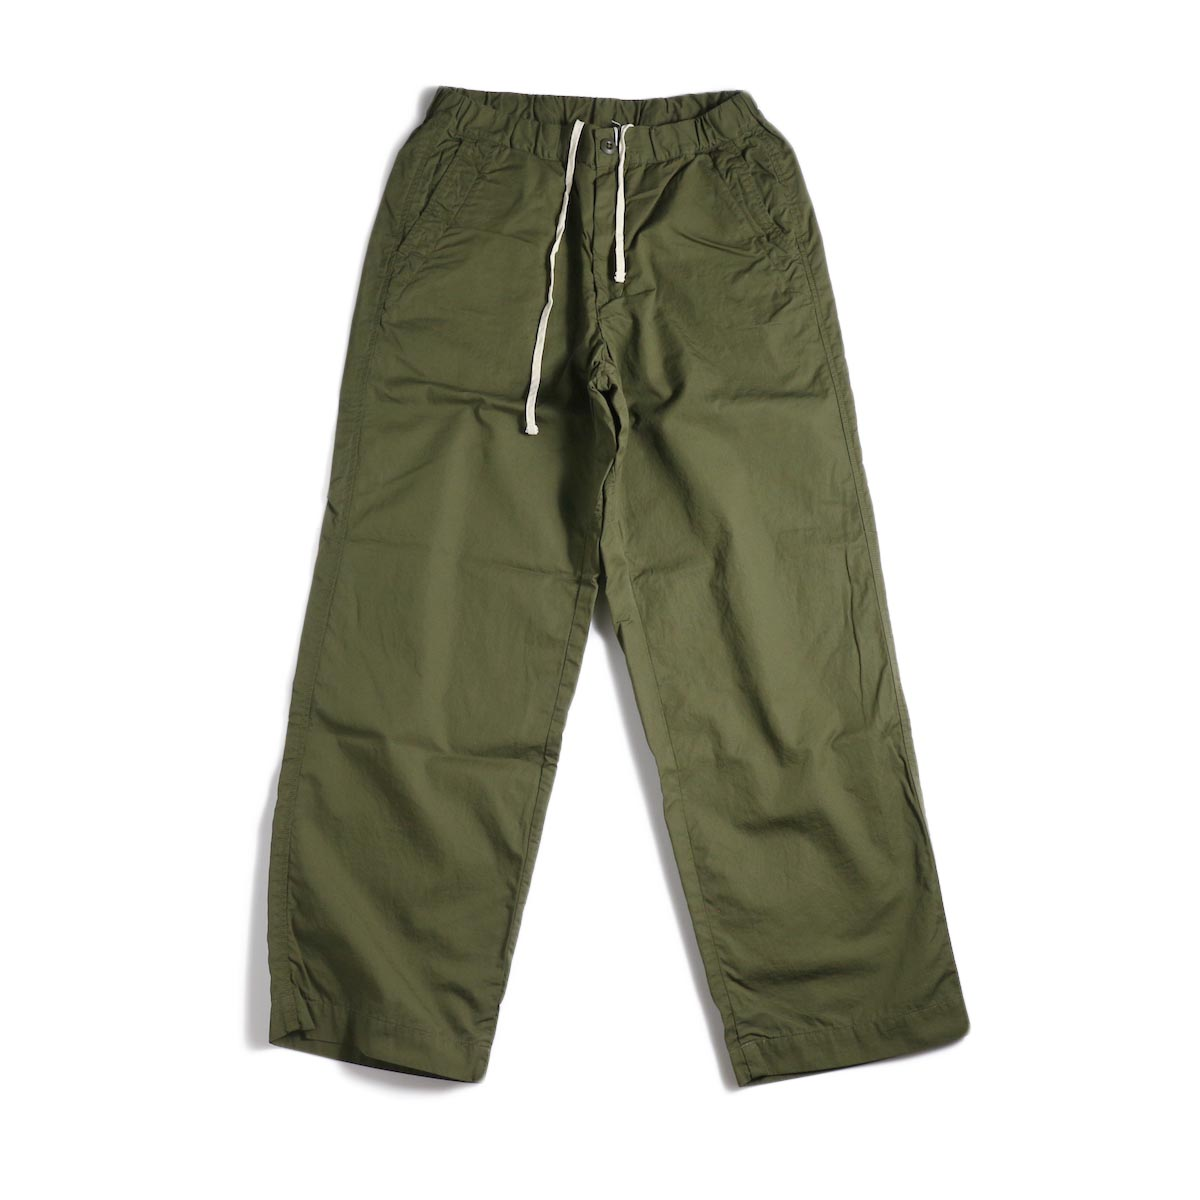 BRENA / Cotton&Linen Washer Kersey Coq Pants (Amg)